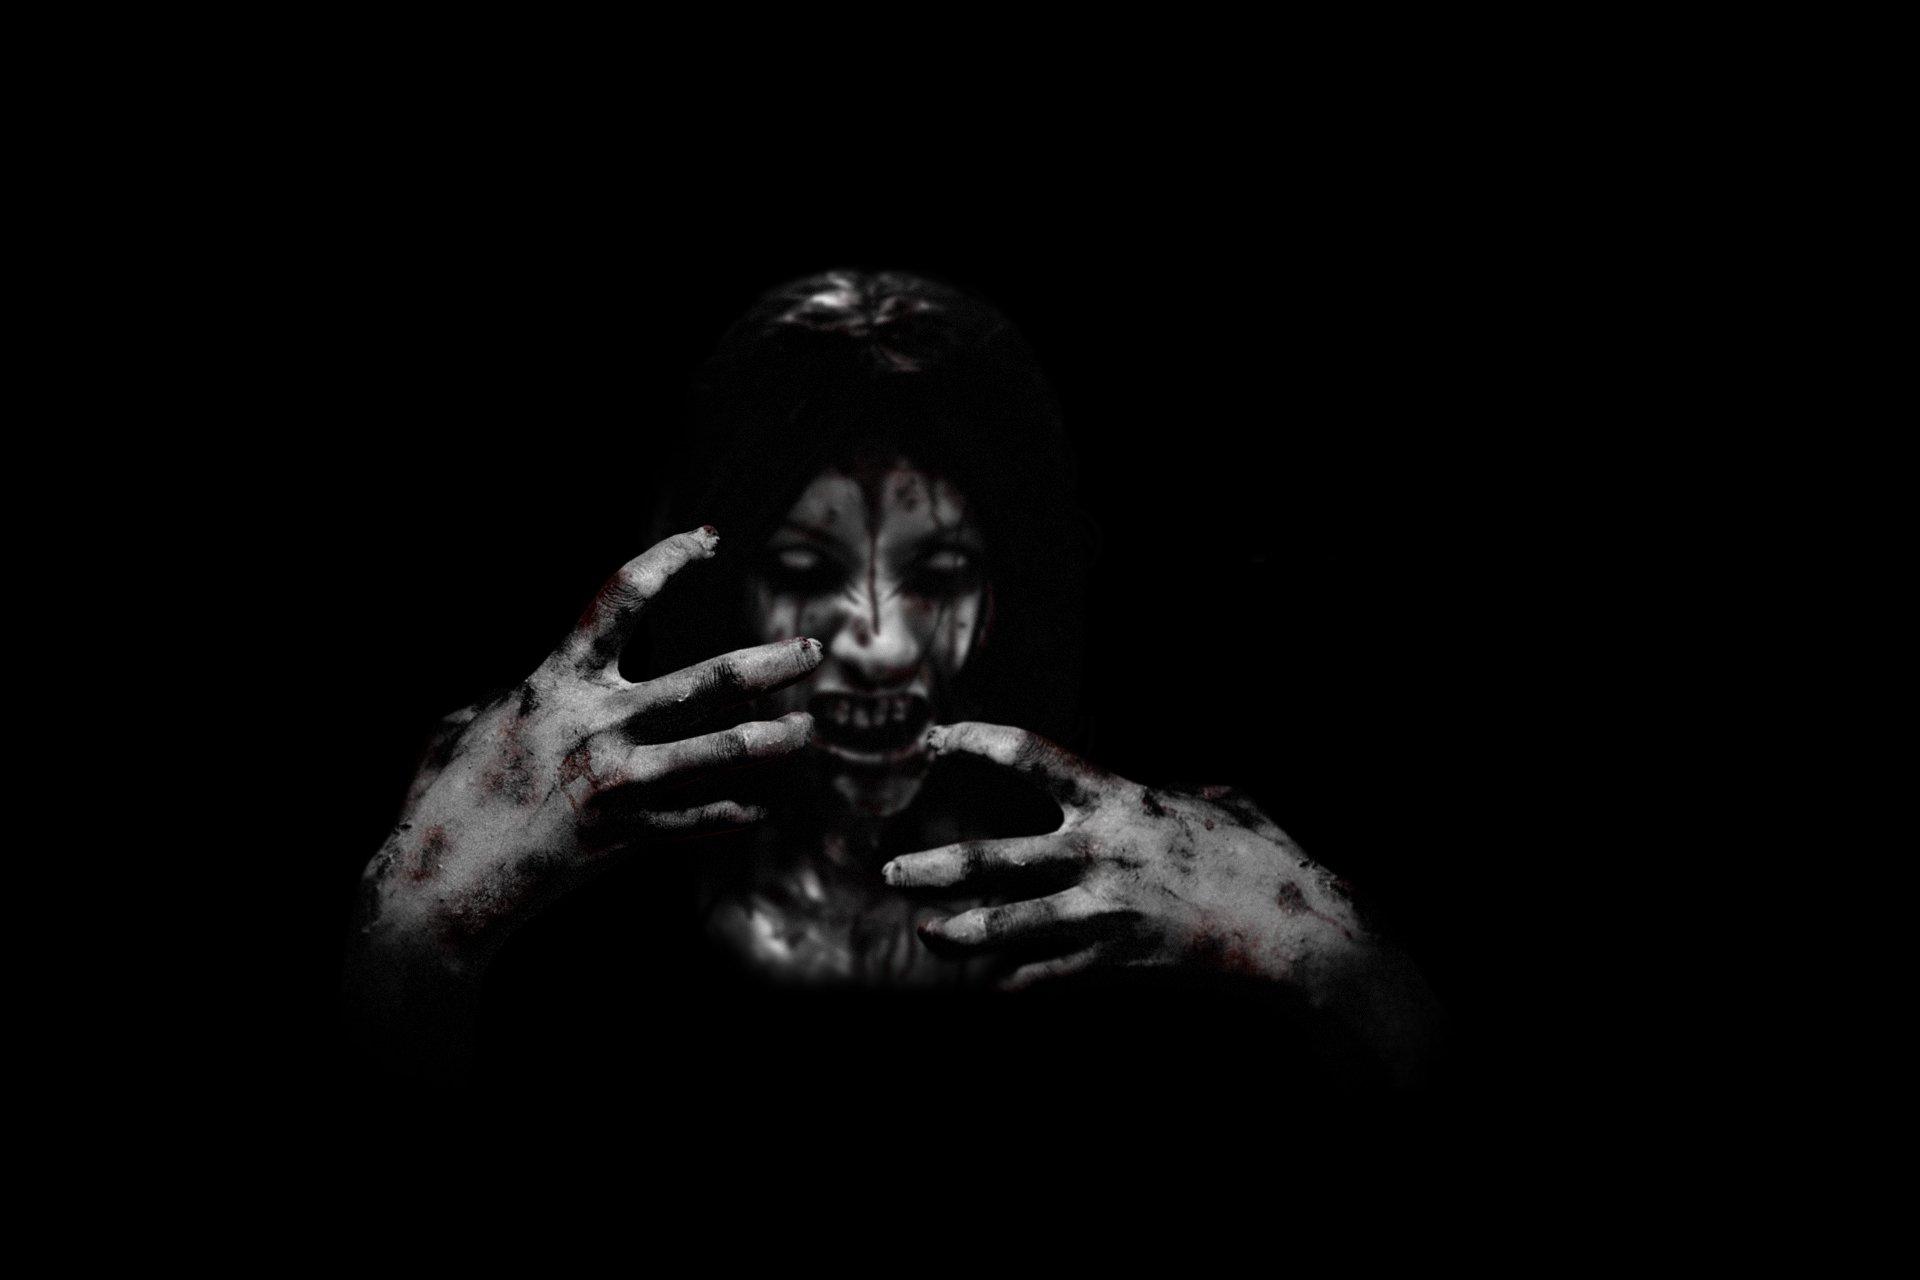 Zombie hd wallpaper background image 1920x1280 id - Dark horror creepy wallpapers ...